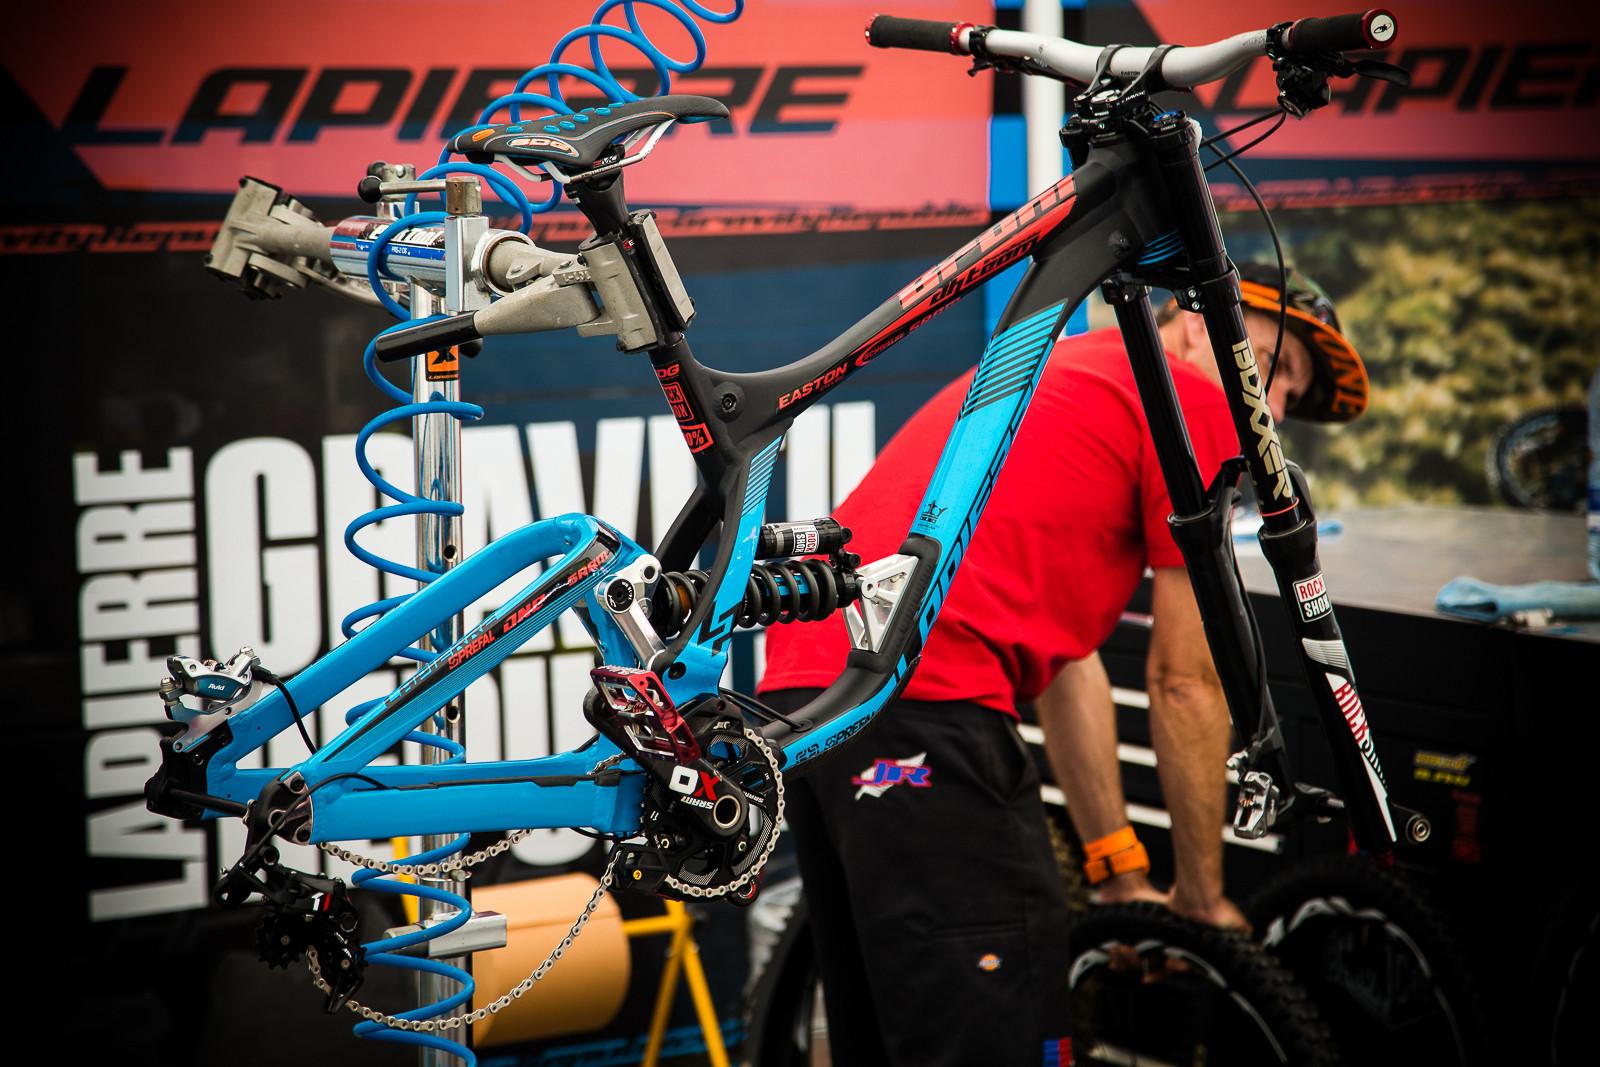 PIT BITS - Loic Bruni's Lapierre DH - PIT BITS - World Cup Lenzerheide, Switzerland - Mountain Biking Pictures - Vital MTB